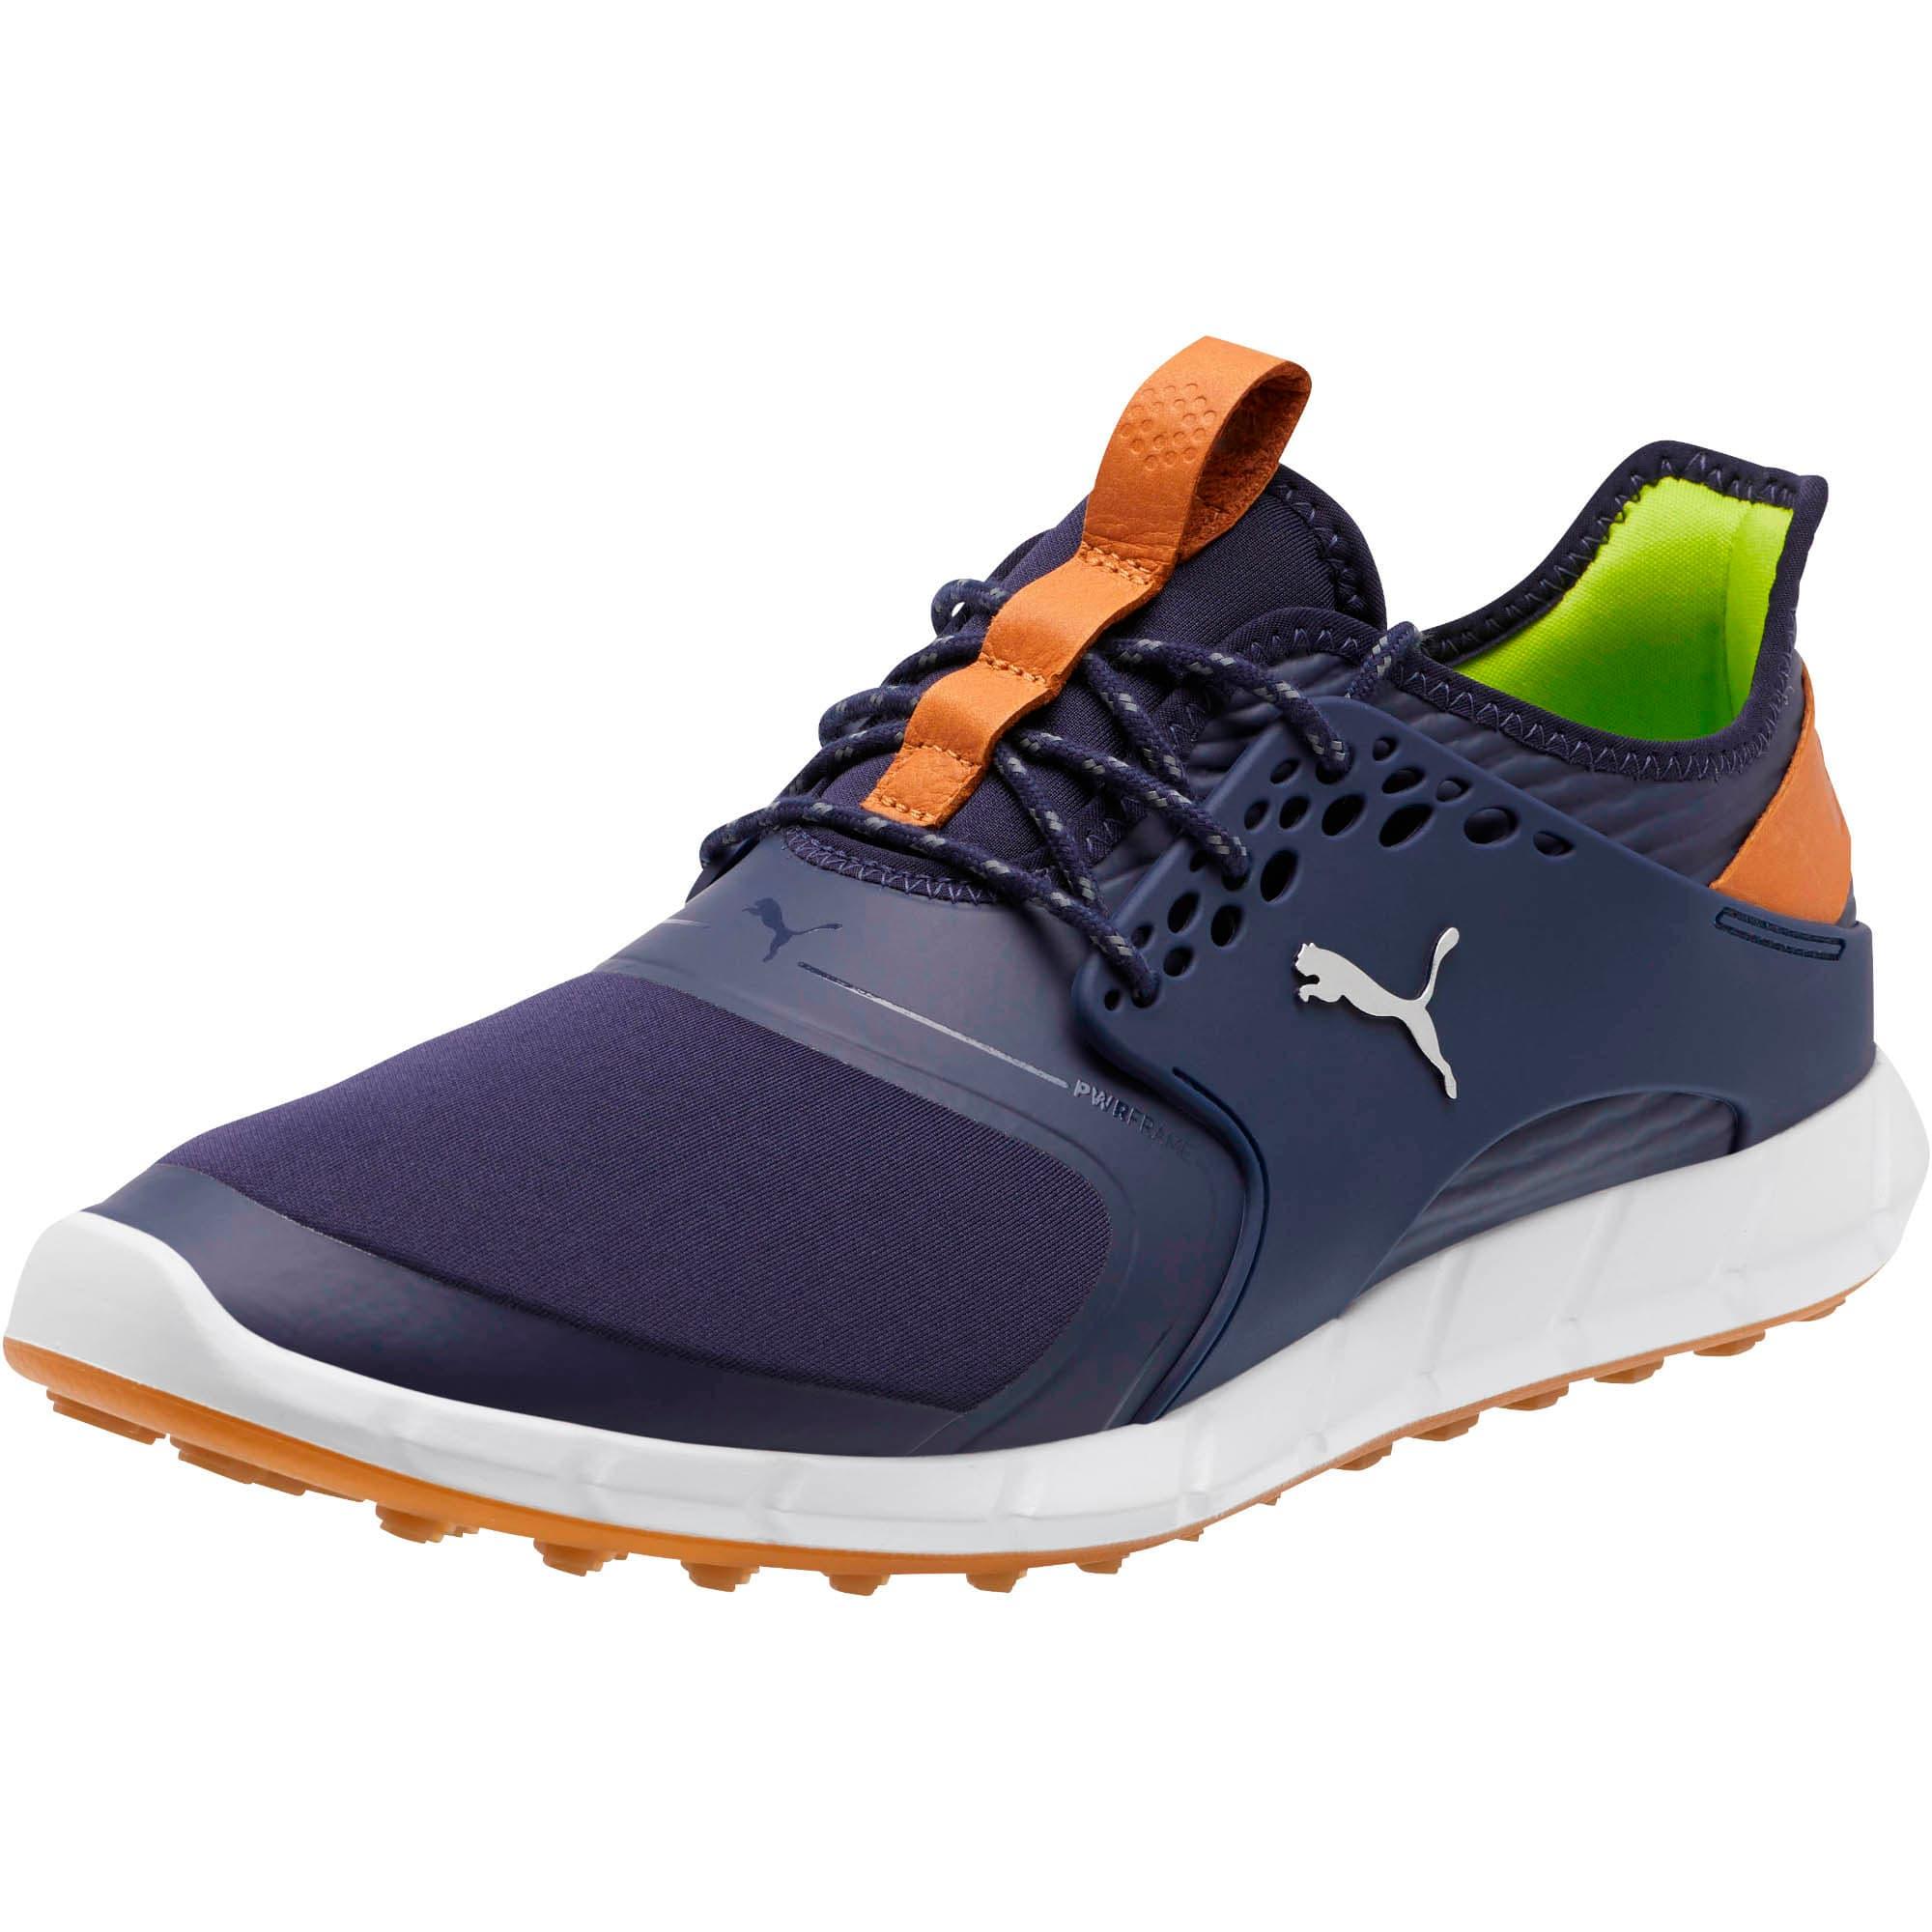 Thumbnail 1 of IGNITE PWRSPORT Men's Golf Shoes, Peacoat-Silver, medium